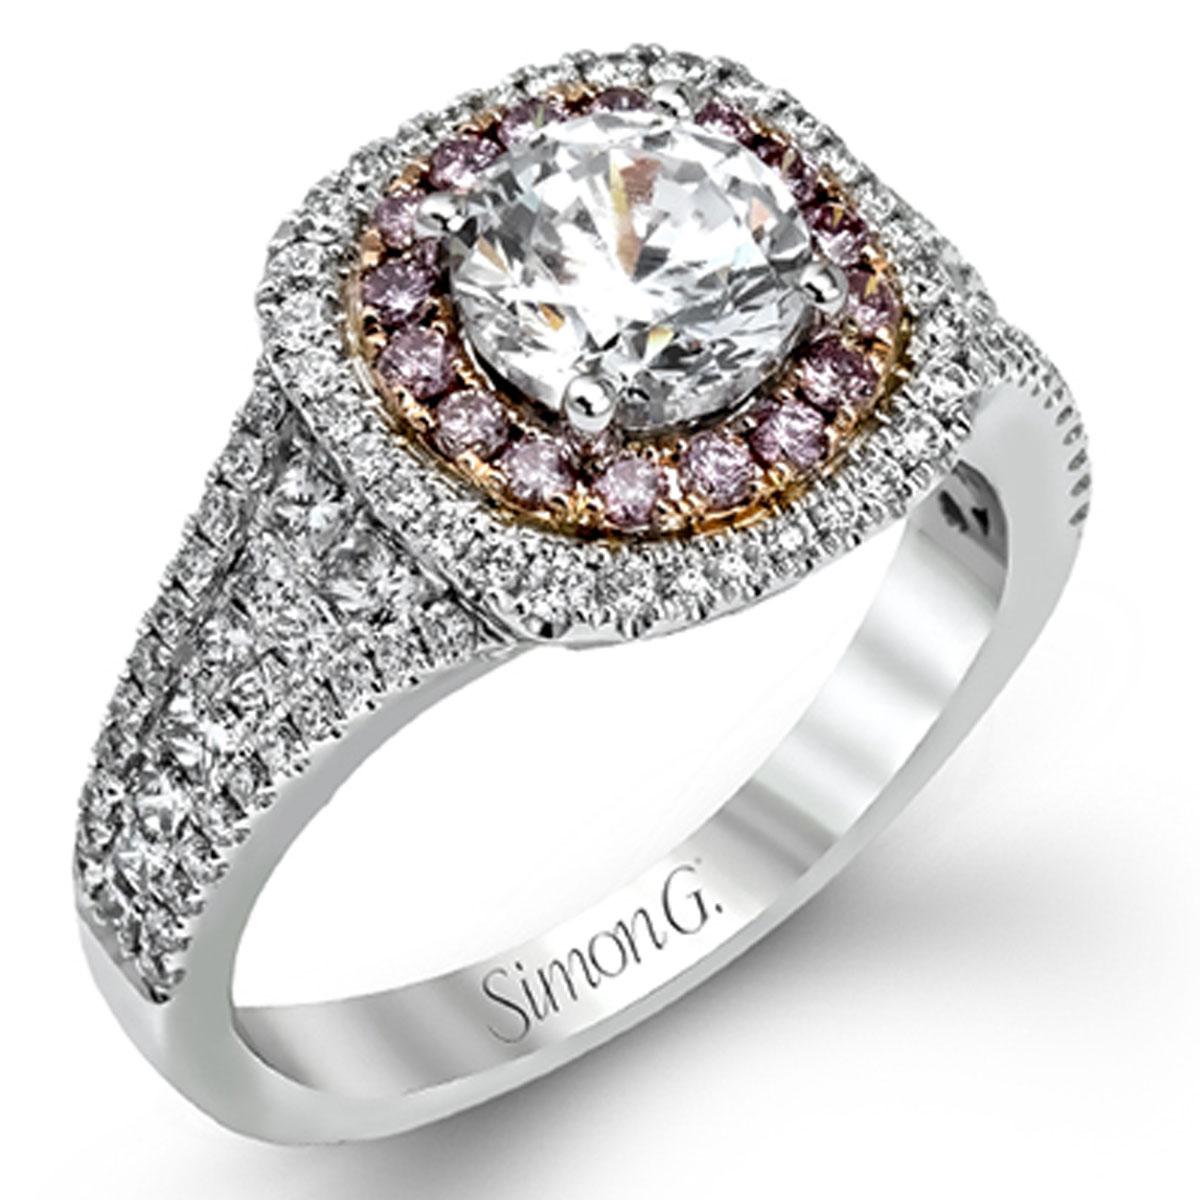 Simon G Engagement Rings 098ctw Diamond Setting Pink Diamonds